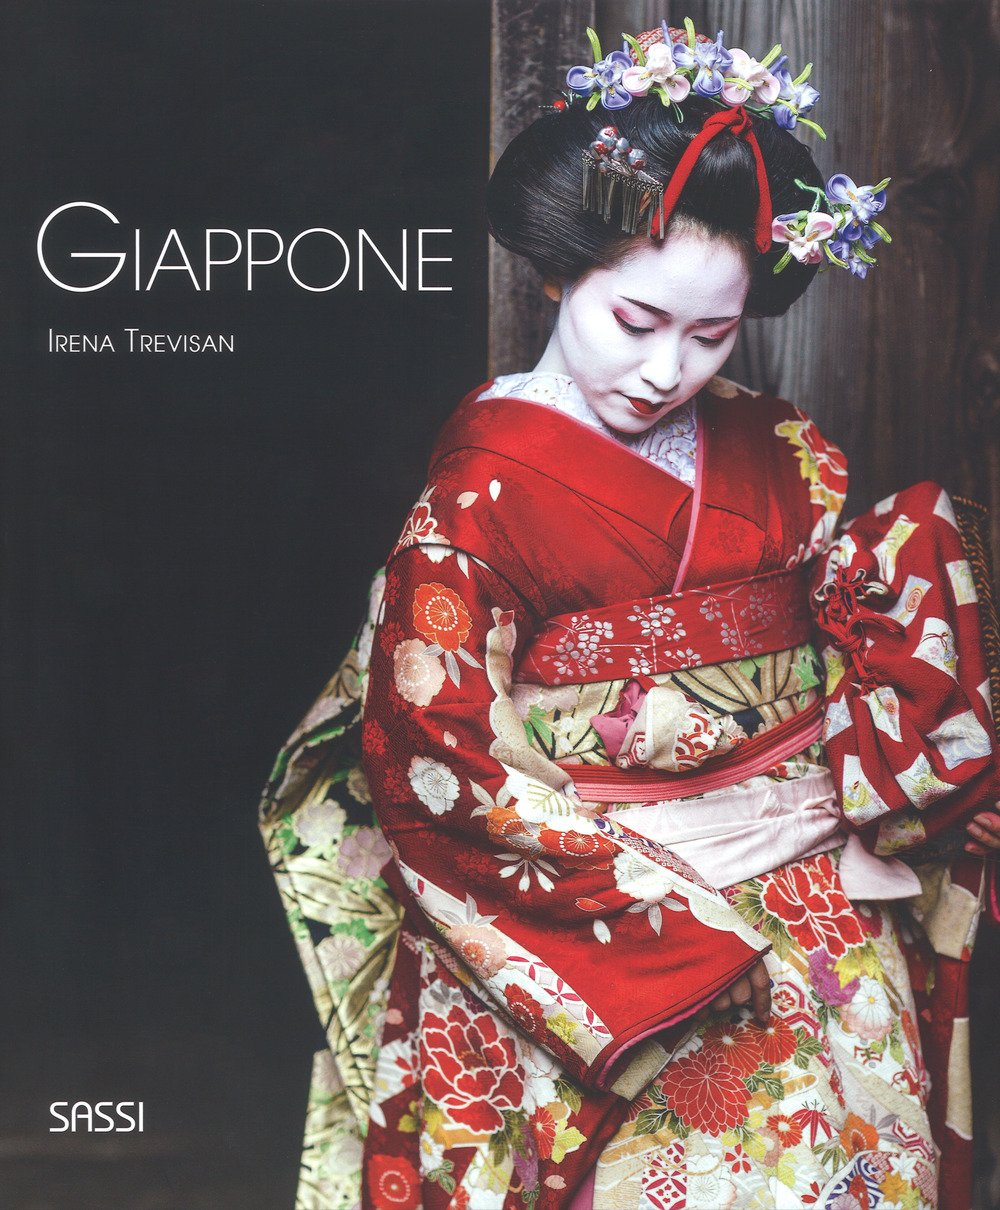 Giappone. Ediz. illustrata Copertina rigida – 5 apr 2018 Irena Trevisan Sassi 8868607263 Altra illustrata